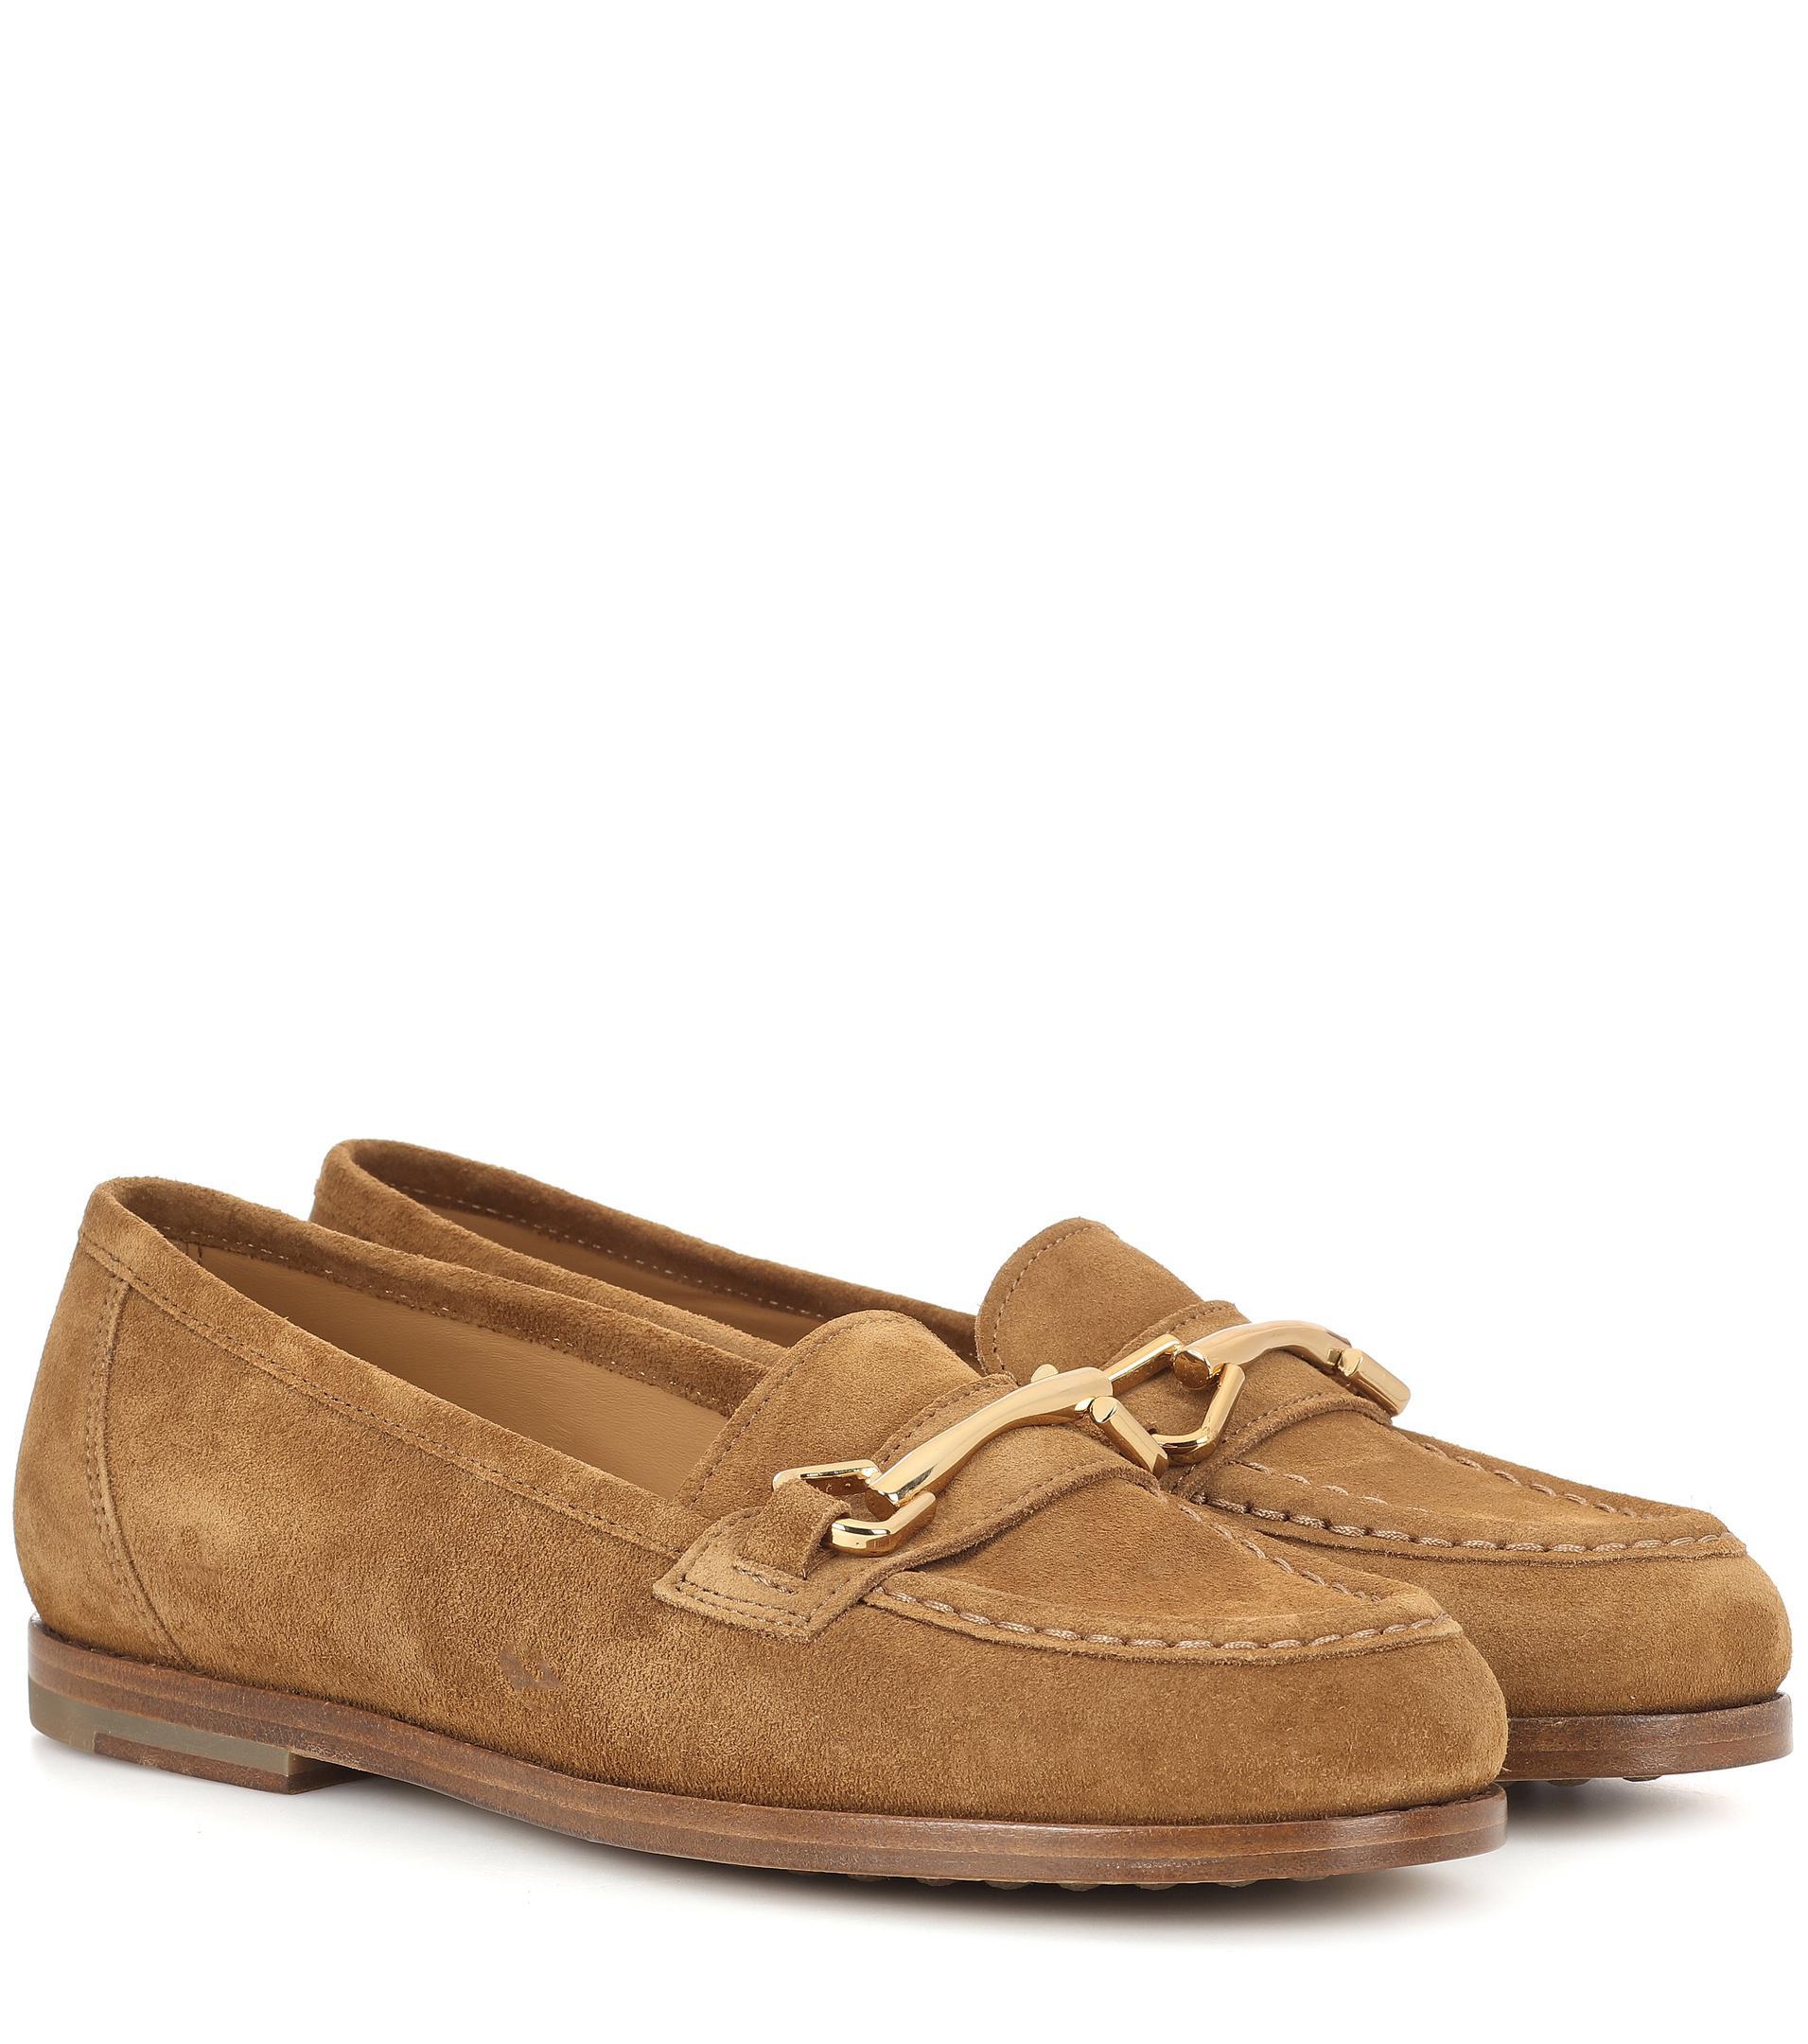 A.P.C Daisy suede loafers Cheap Shop Cheap Reliable Sale Wiki rXR3x